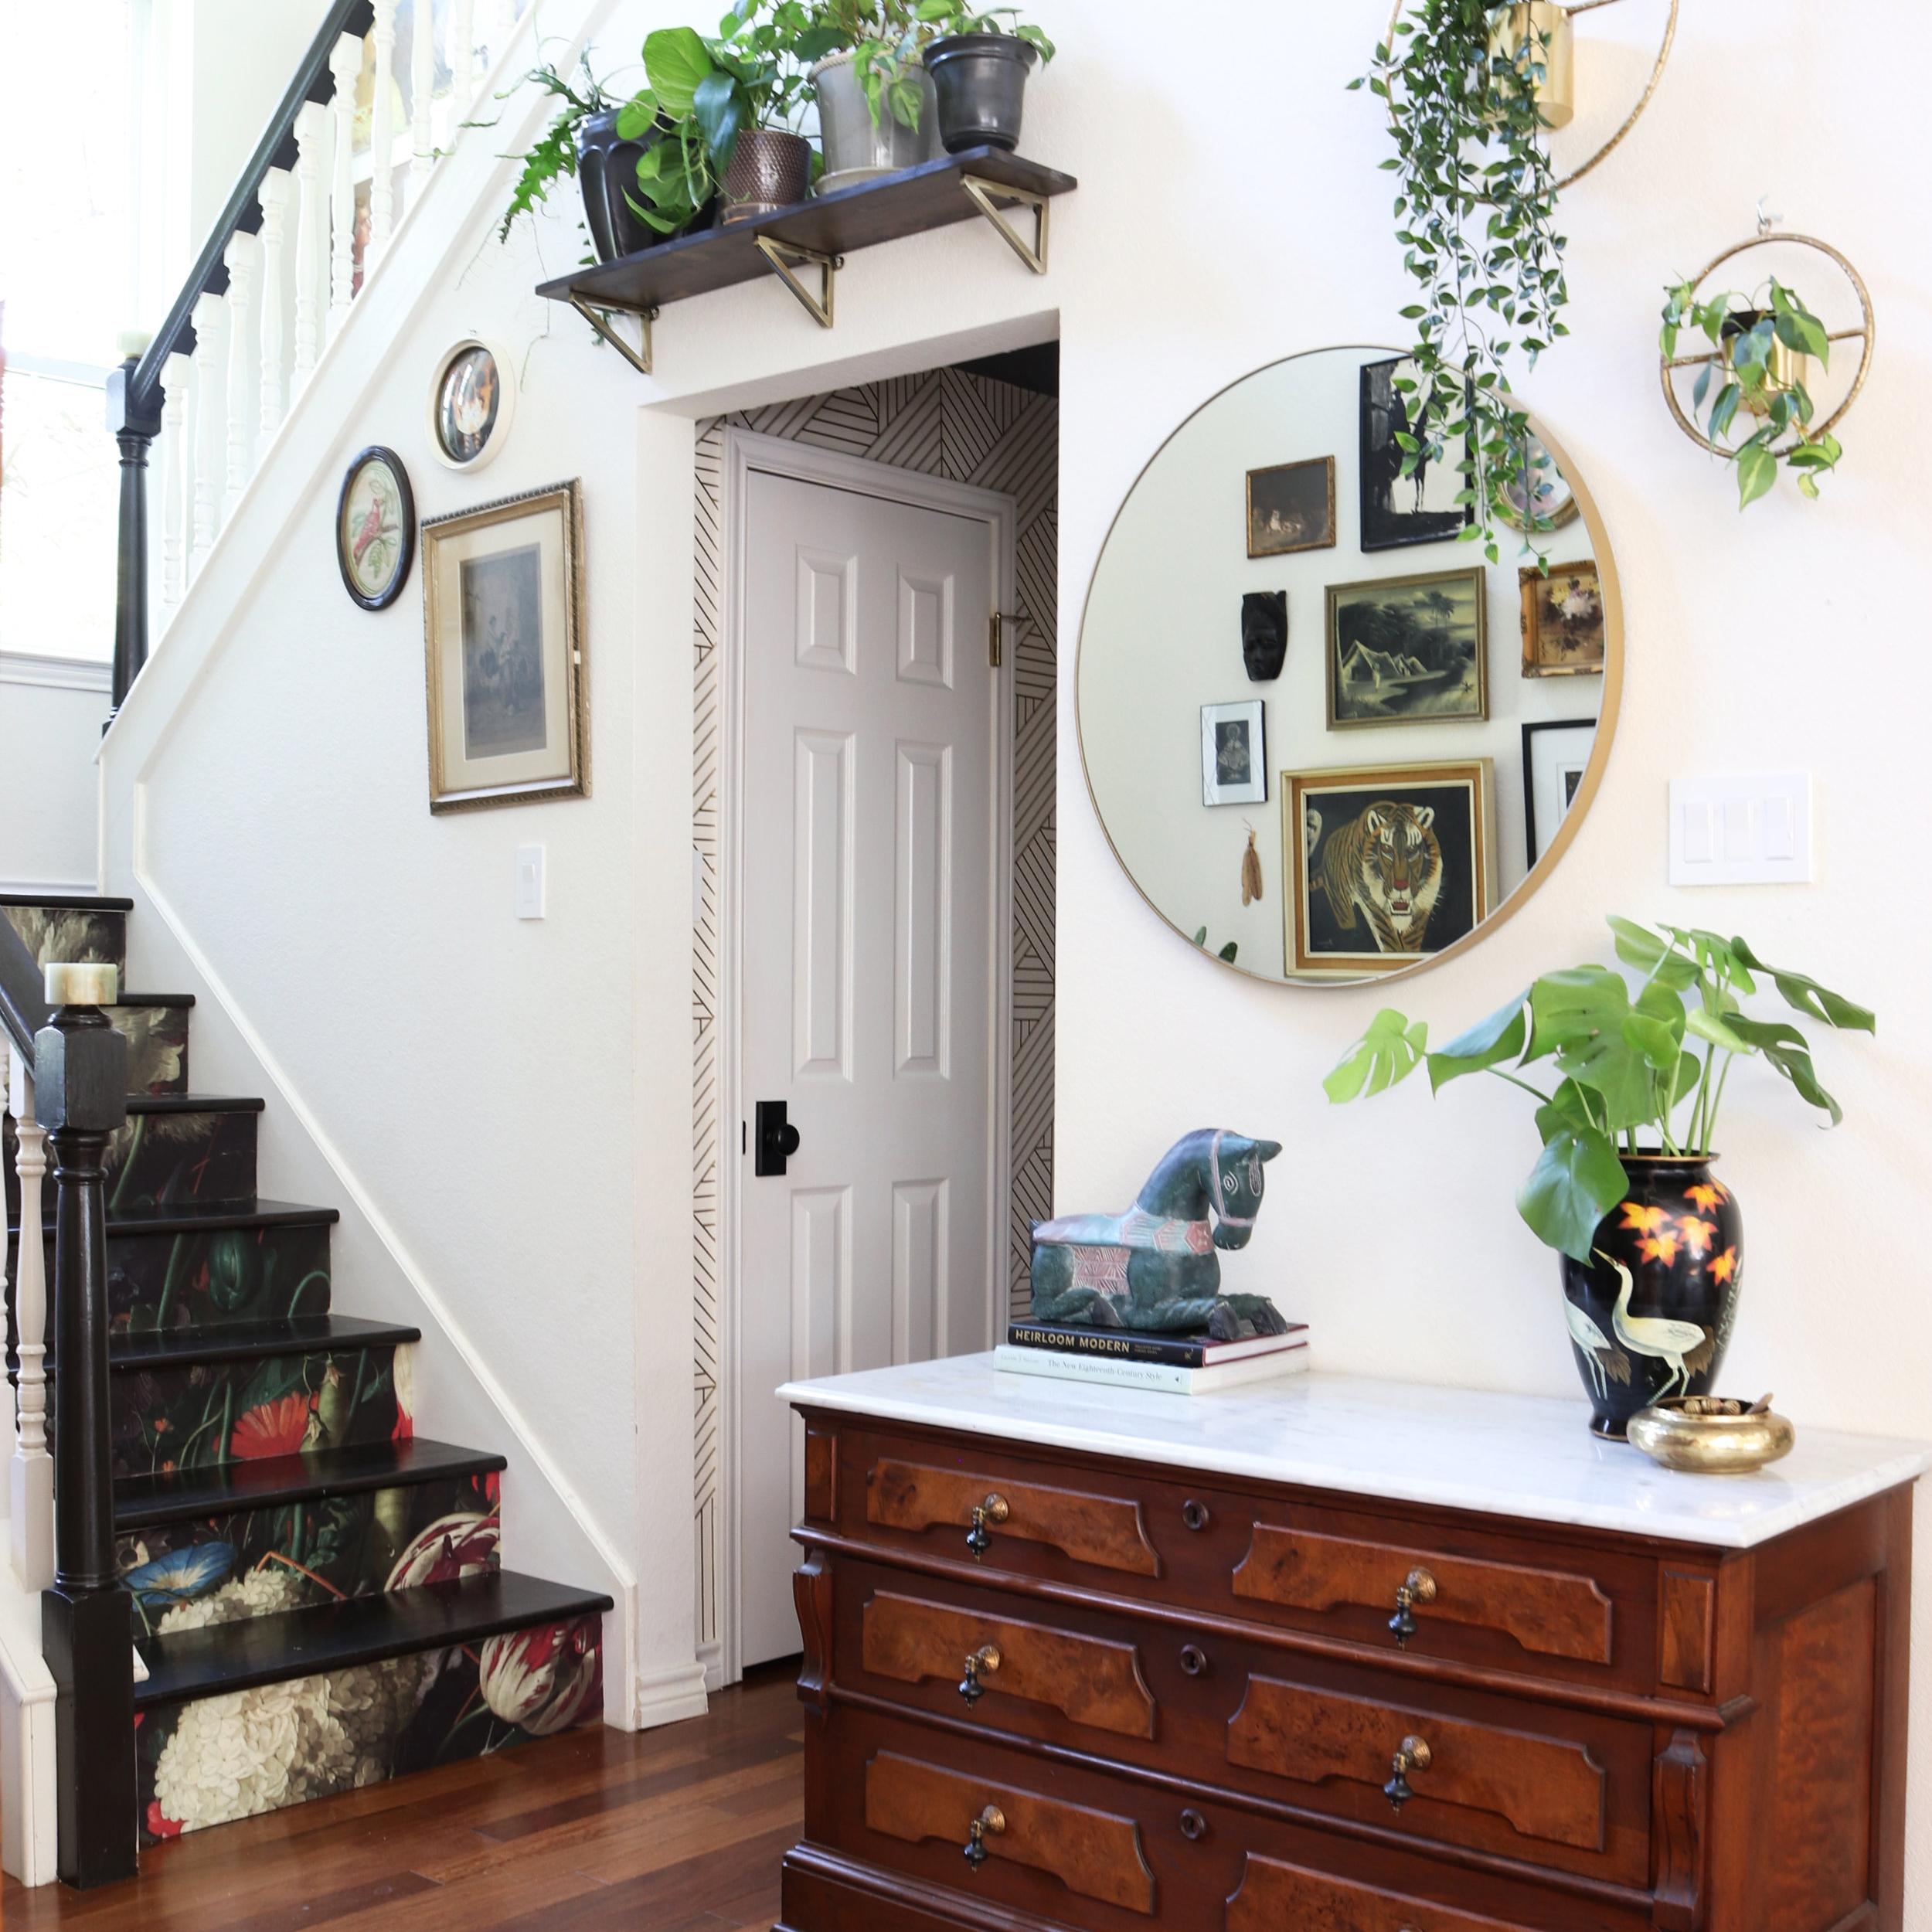 kristin laing wallpapered stairway.jpg